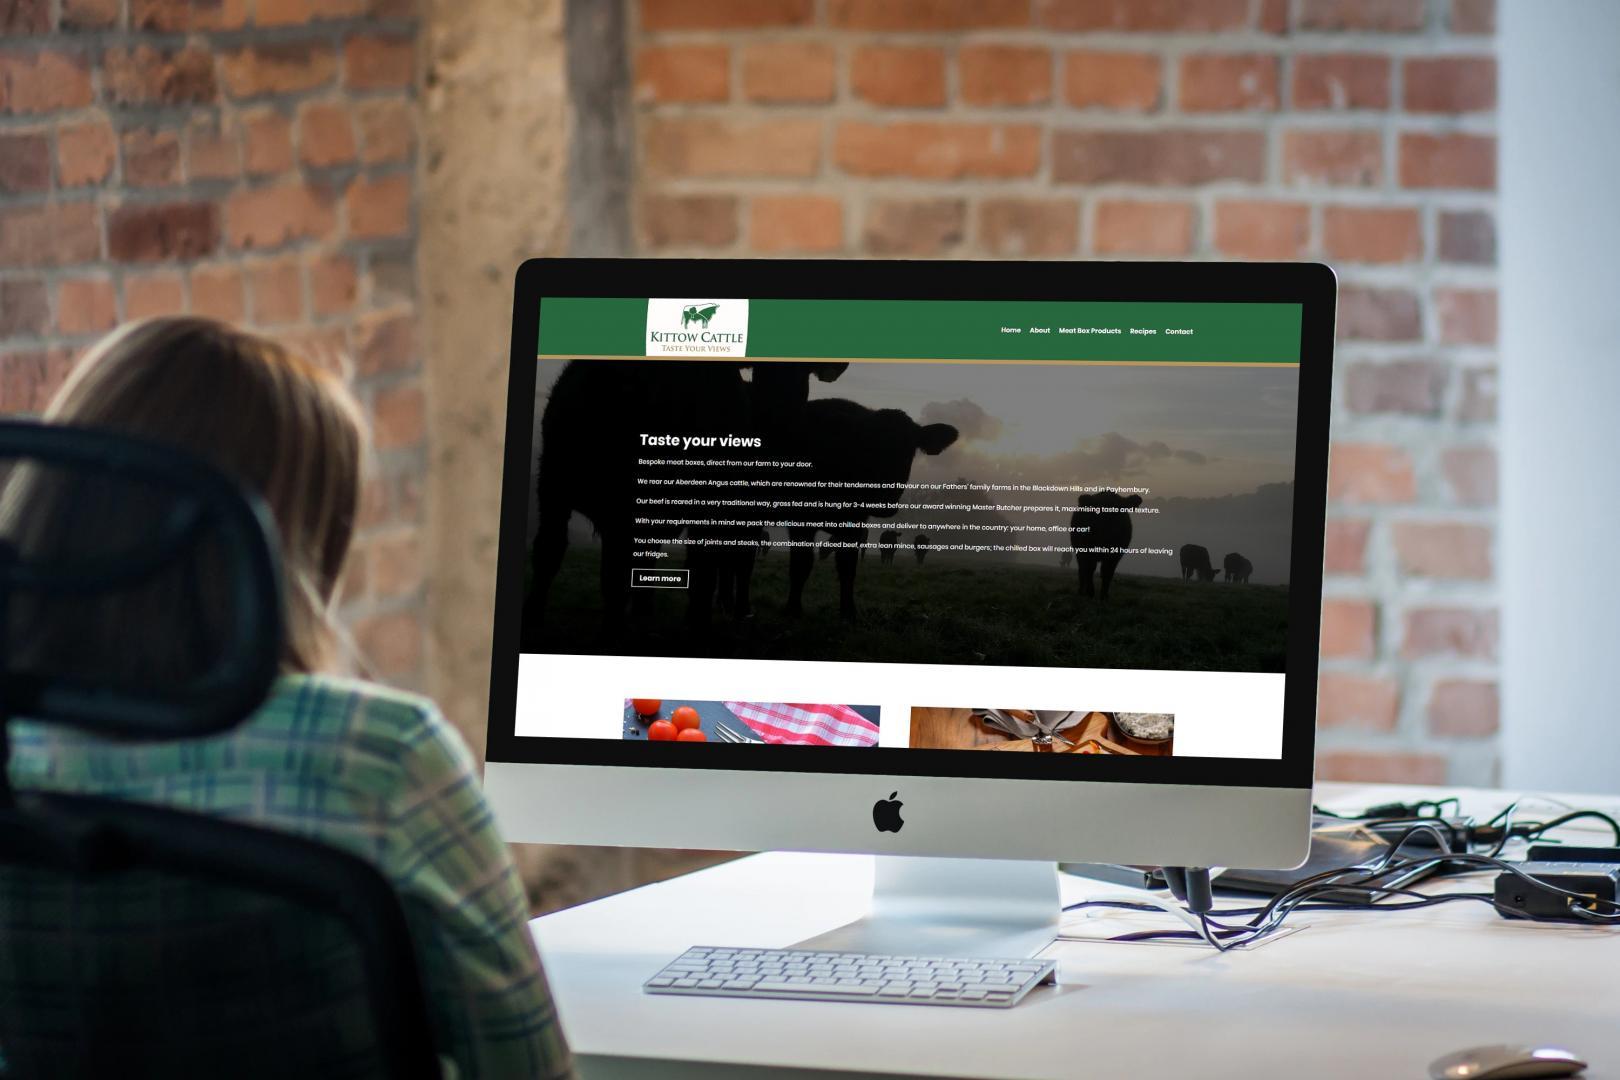 Kittow Cattle website